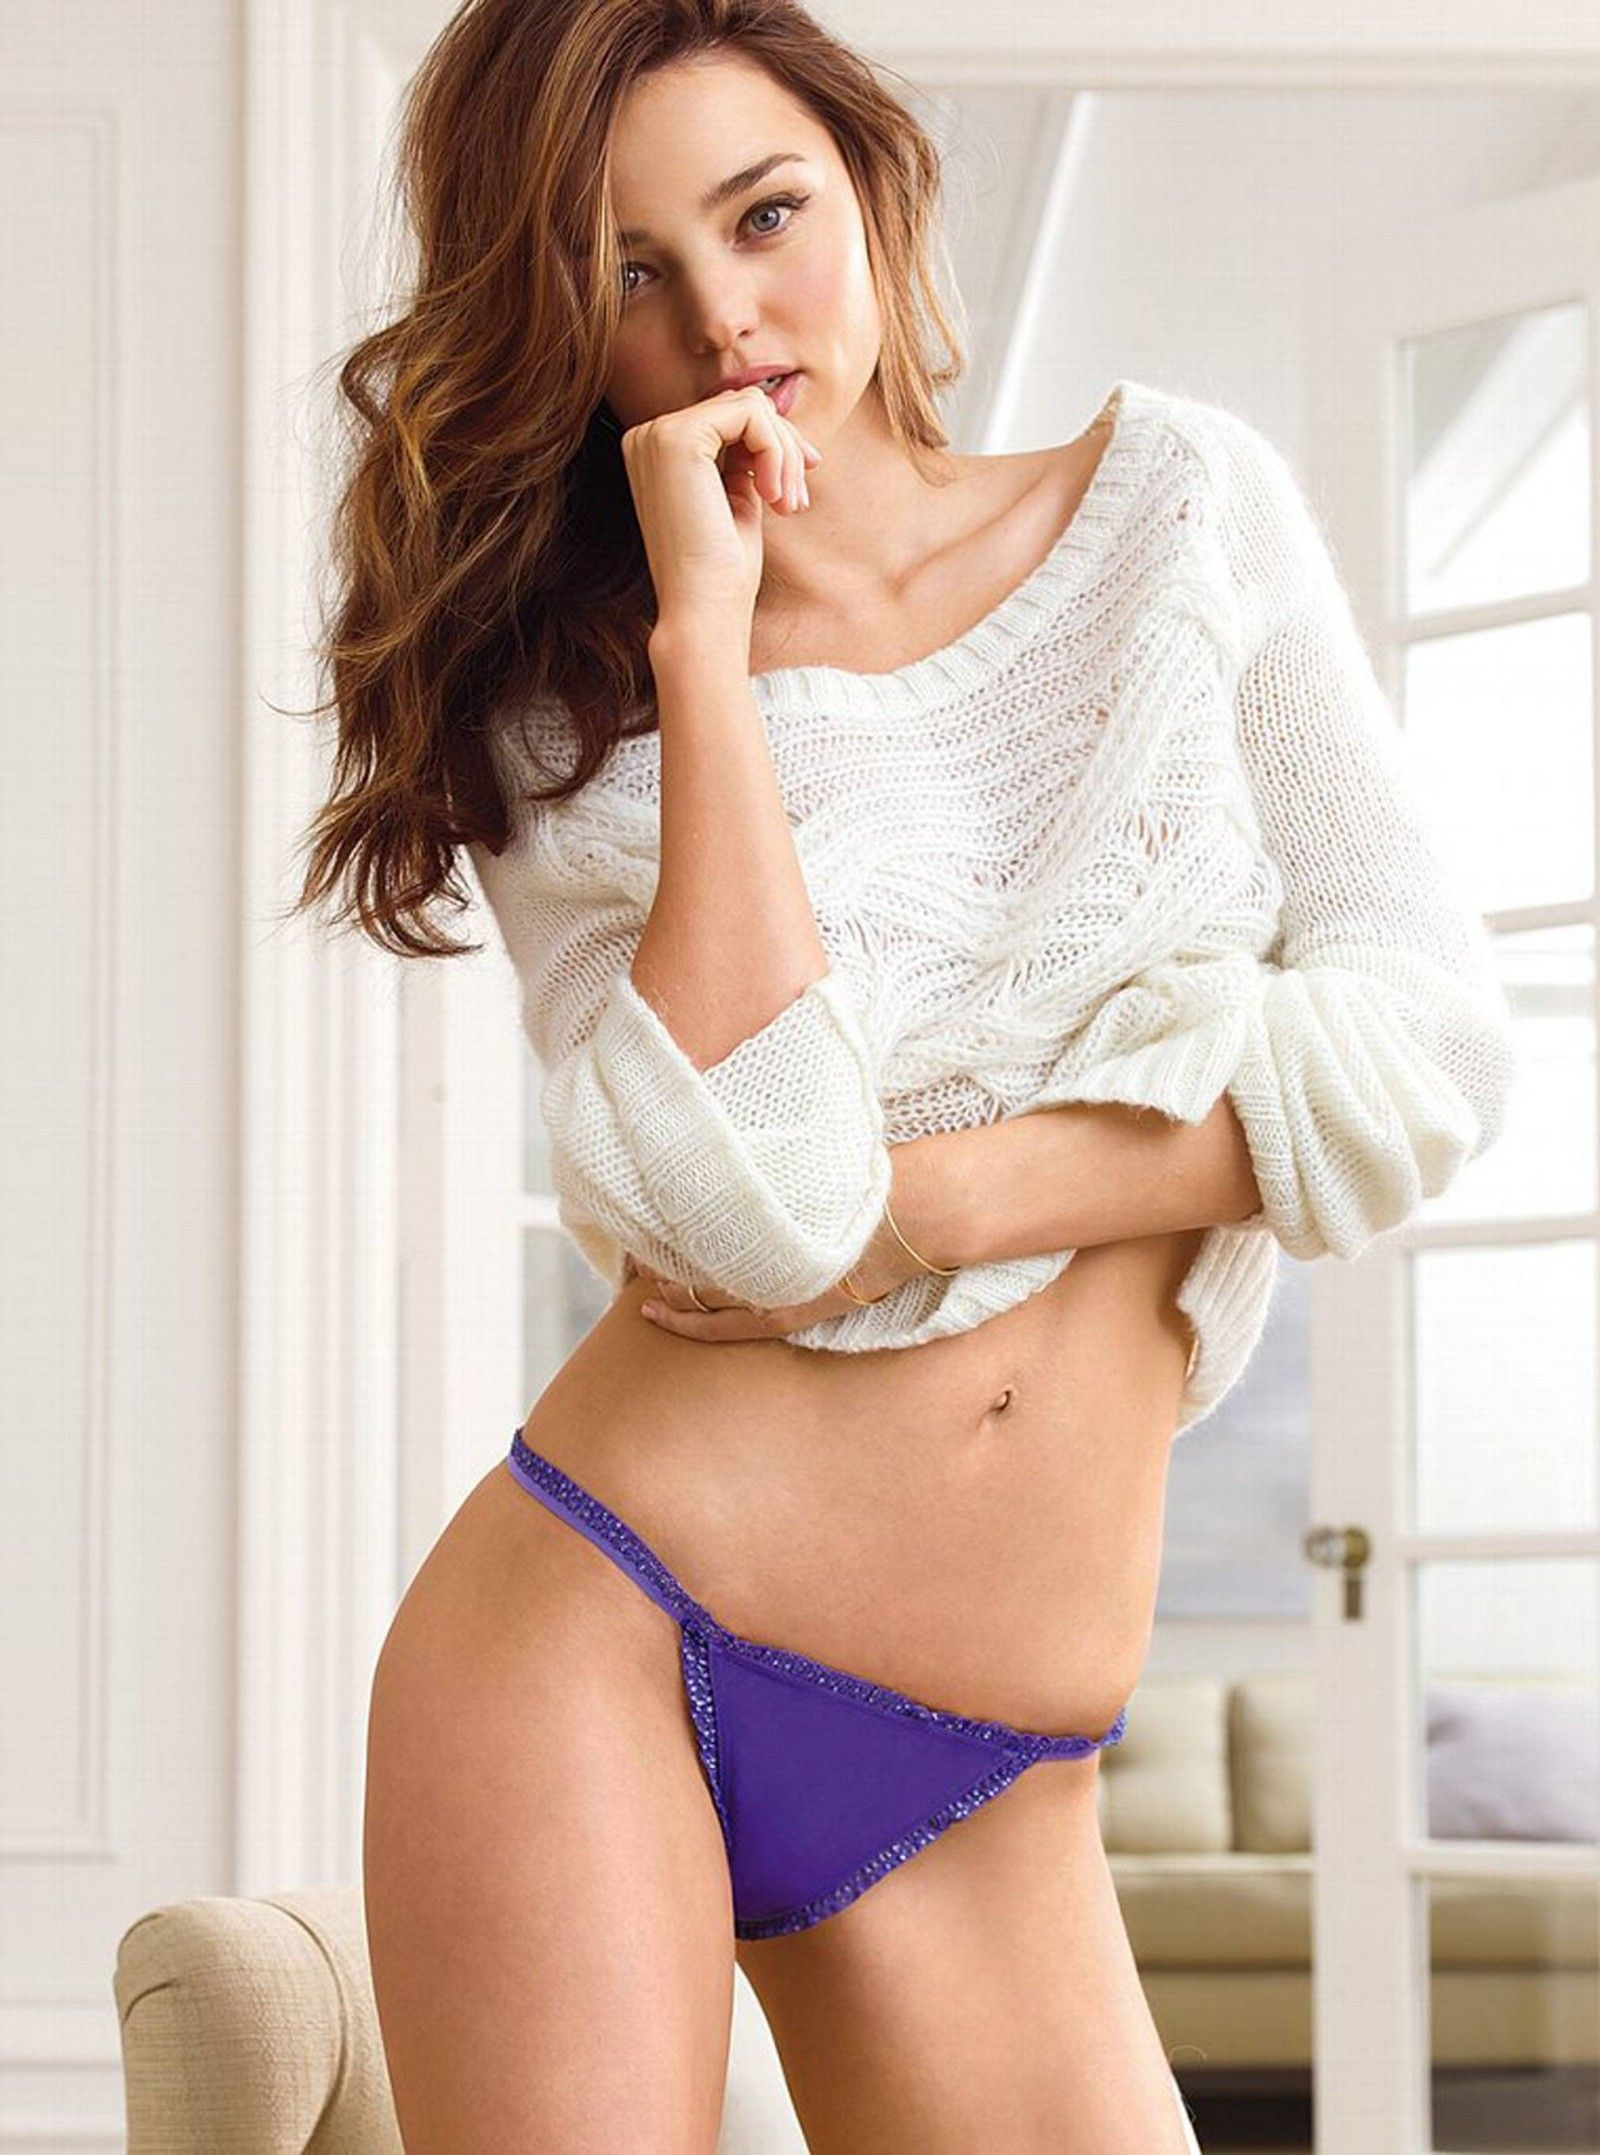 Miranda Kerr in Victoria's Secret lingerie ...   Miranda Kerr ...